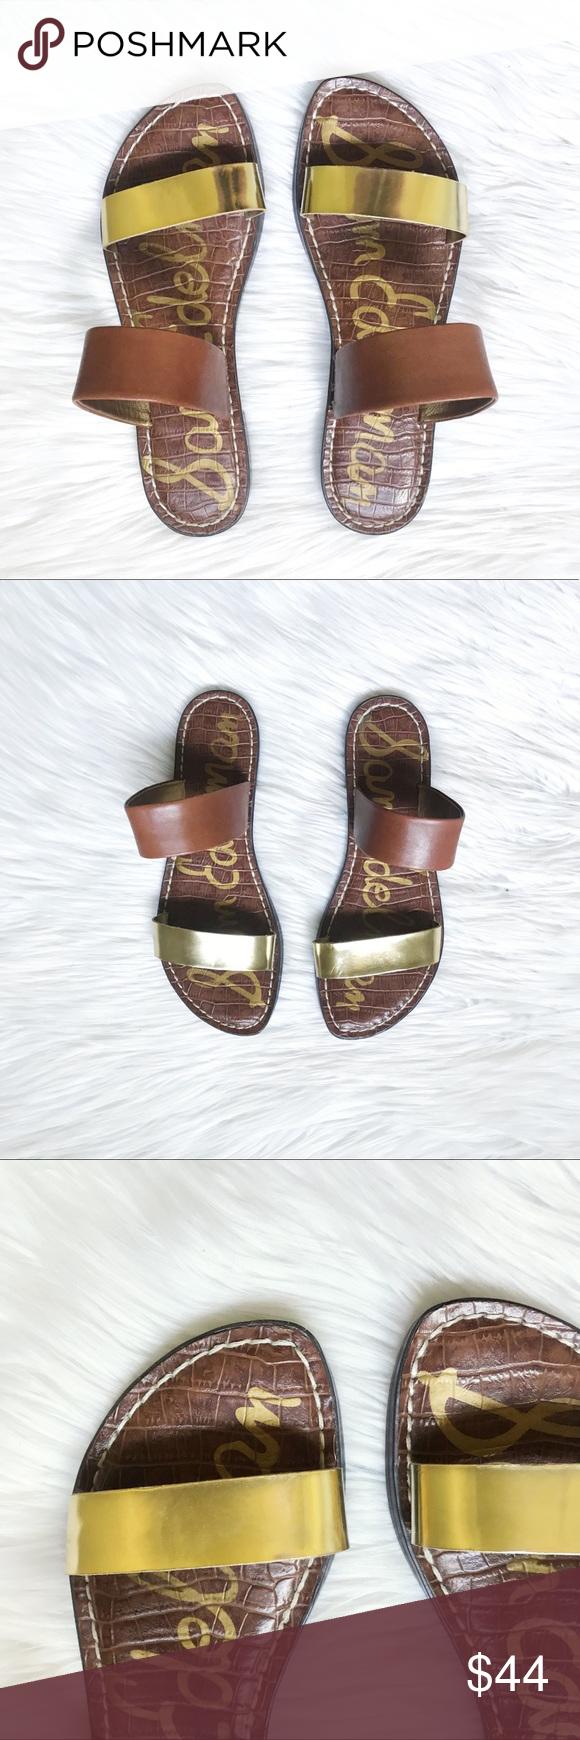 6c4feab72475e Sam Edelman Krista Flat Strap Sandal Sam Edelman Krista Flat Sandal Size   8M Color